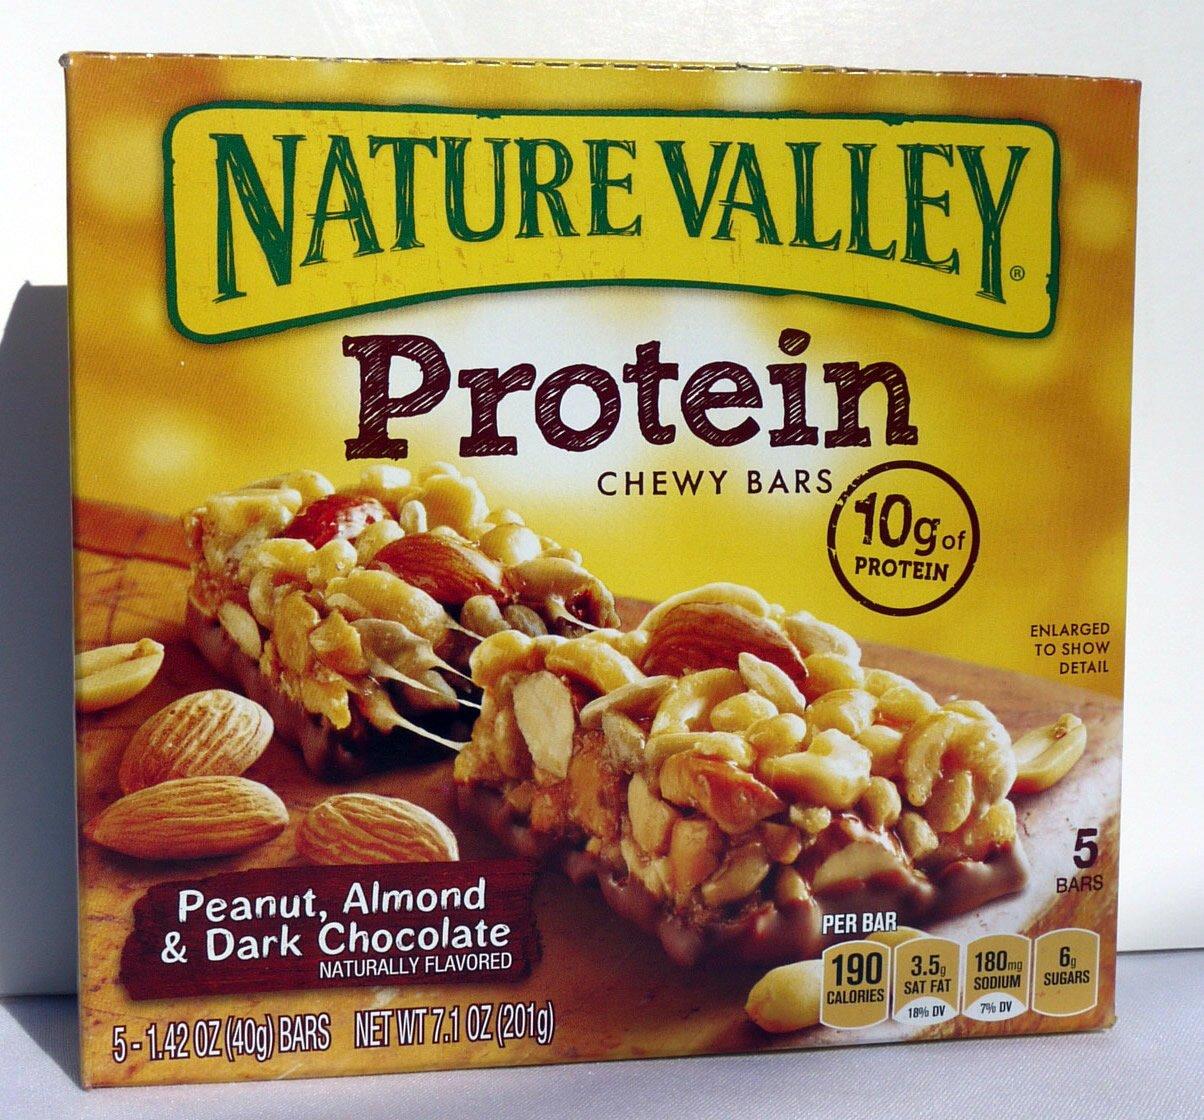 Nature Valley Protein Bar, Peanut, Almond & Dark Chocolate, 7.1 Oz. 5 Bars Ea. (Pack of 5)